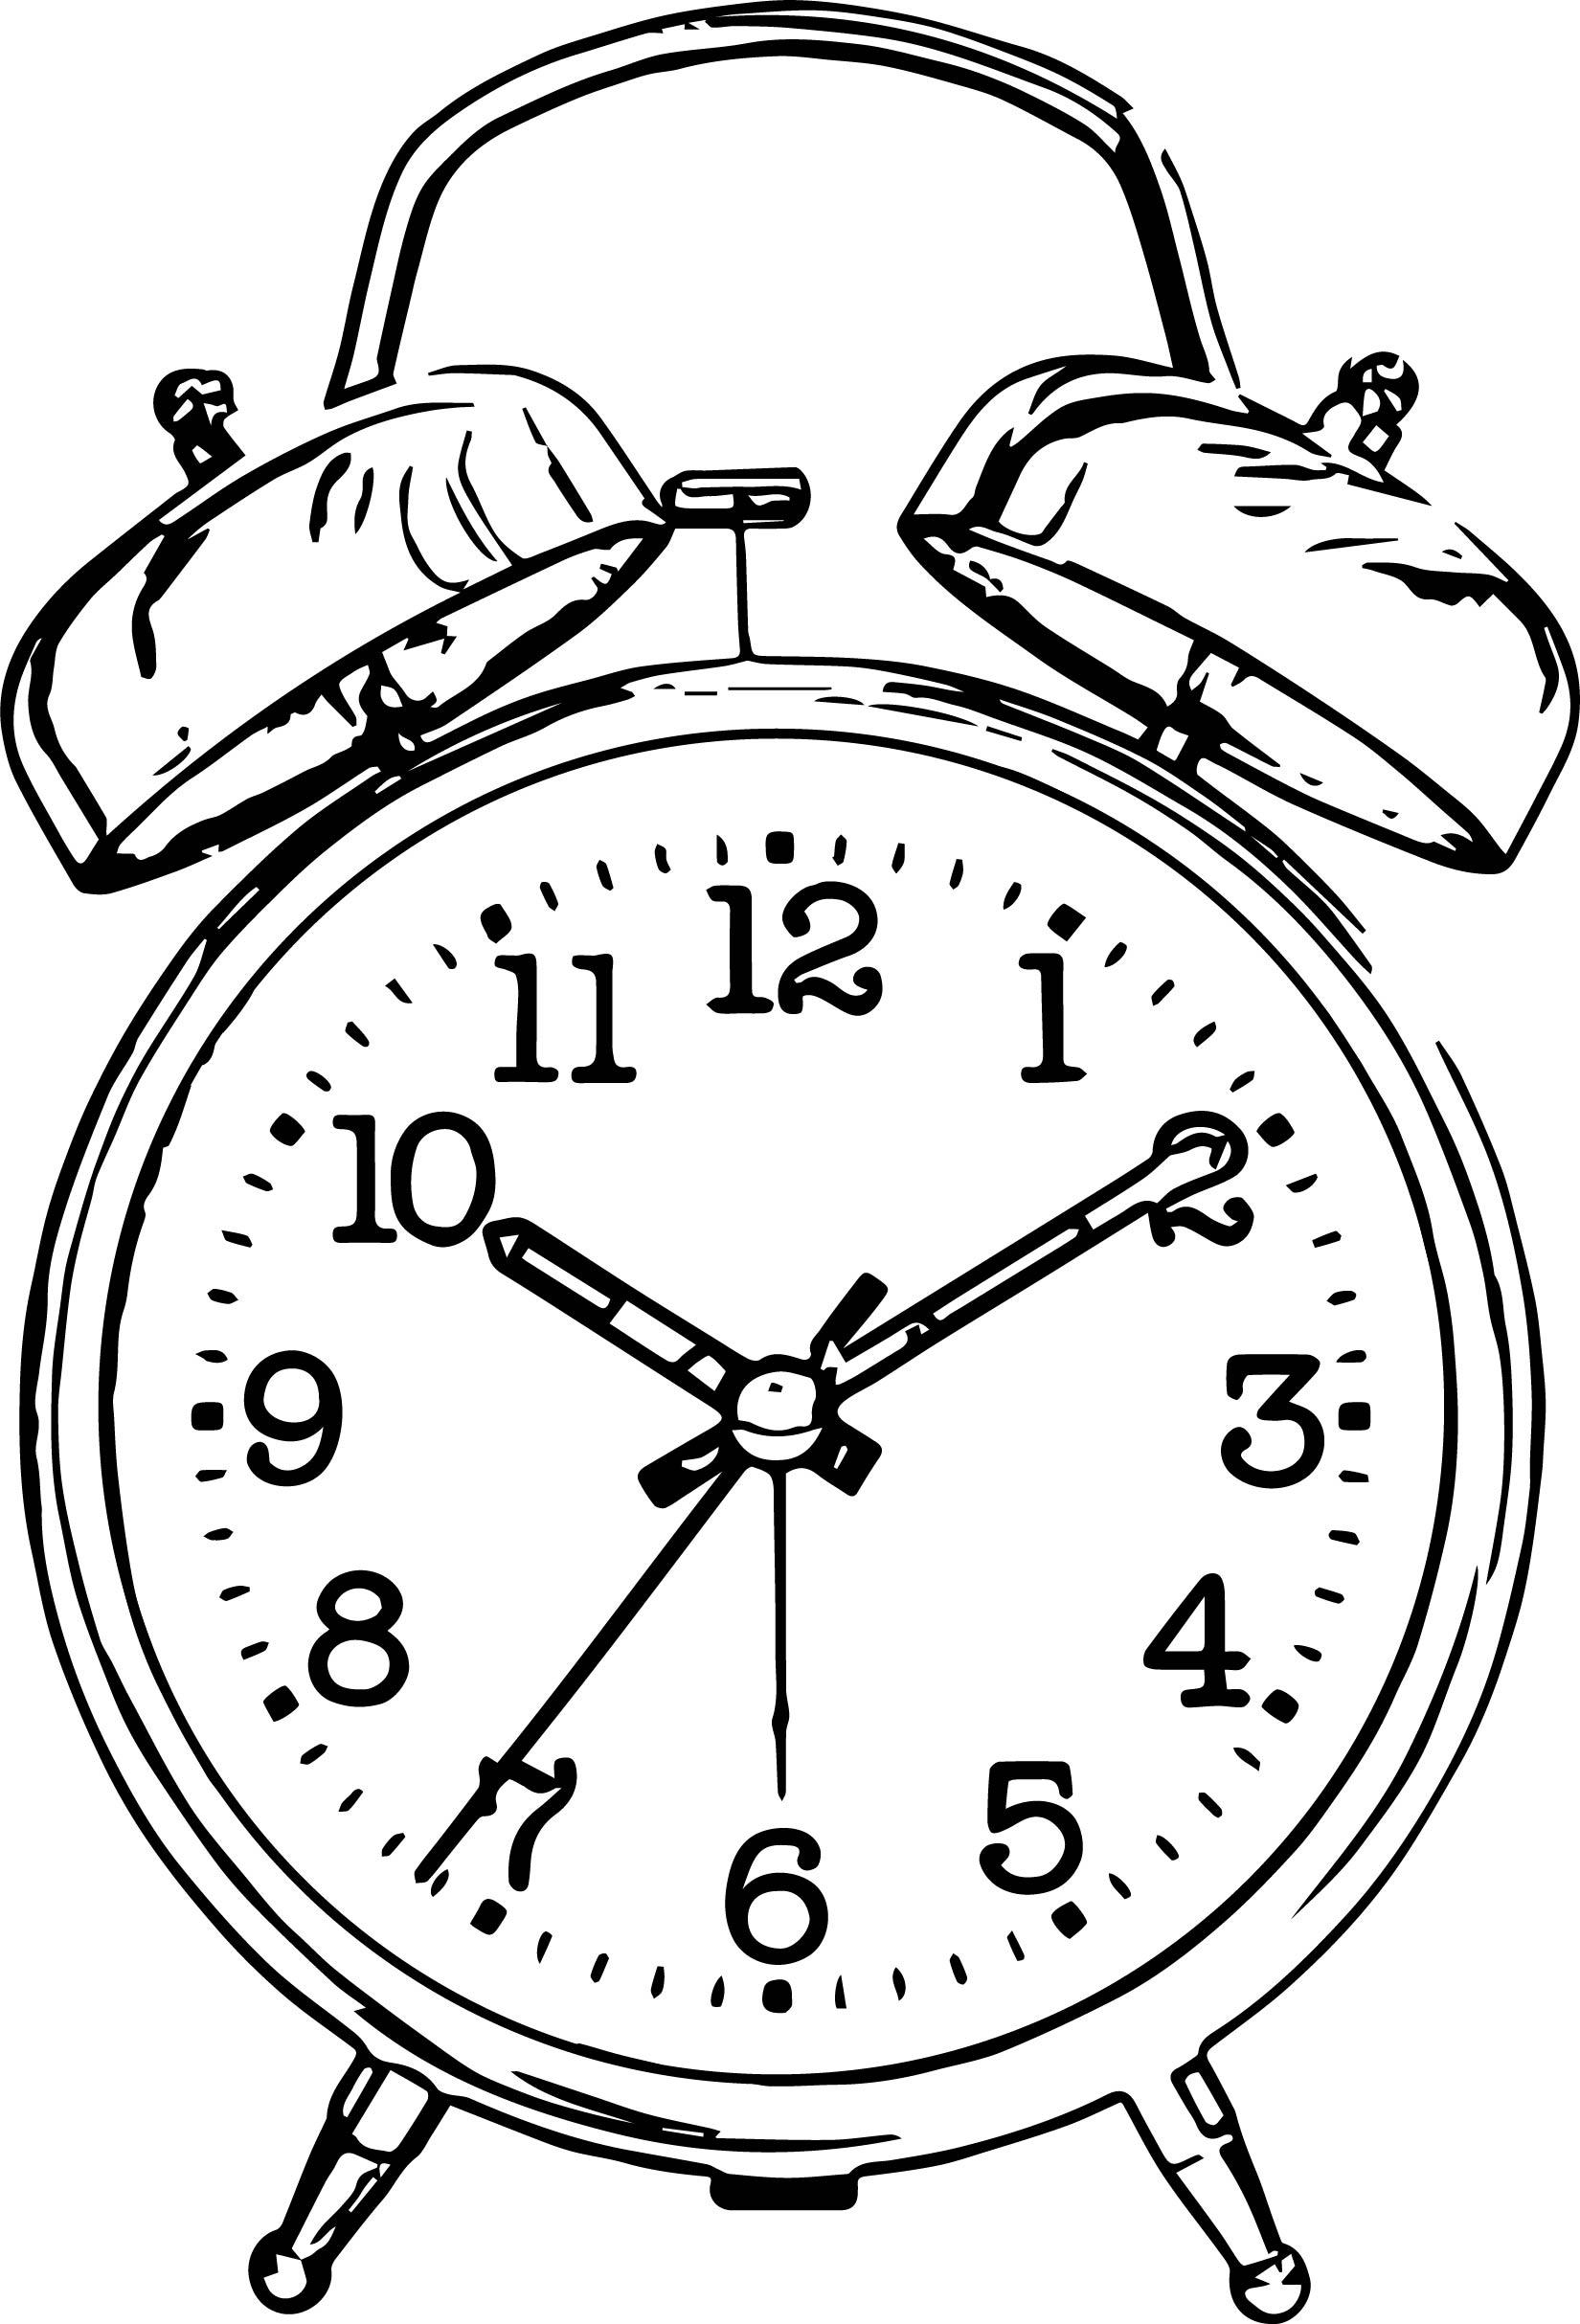 Clock Coloring Page Wecoloringpage 015 Wecoloringpage Com